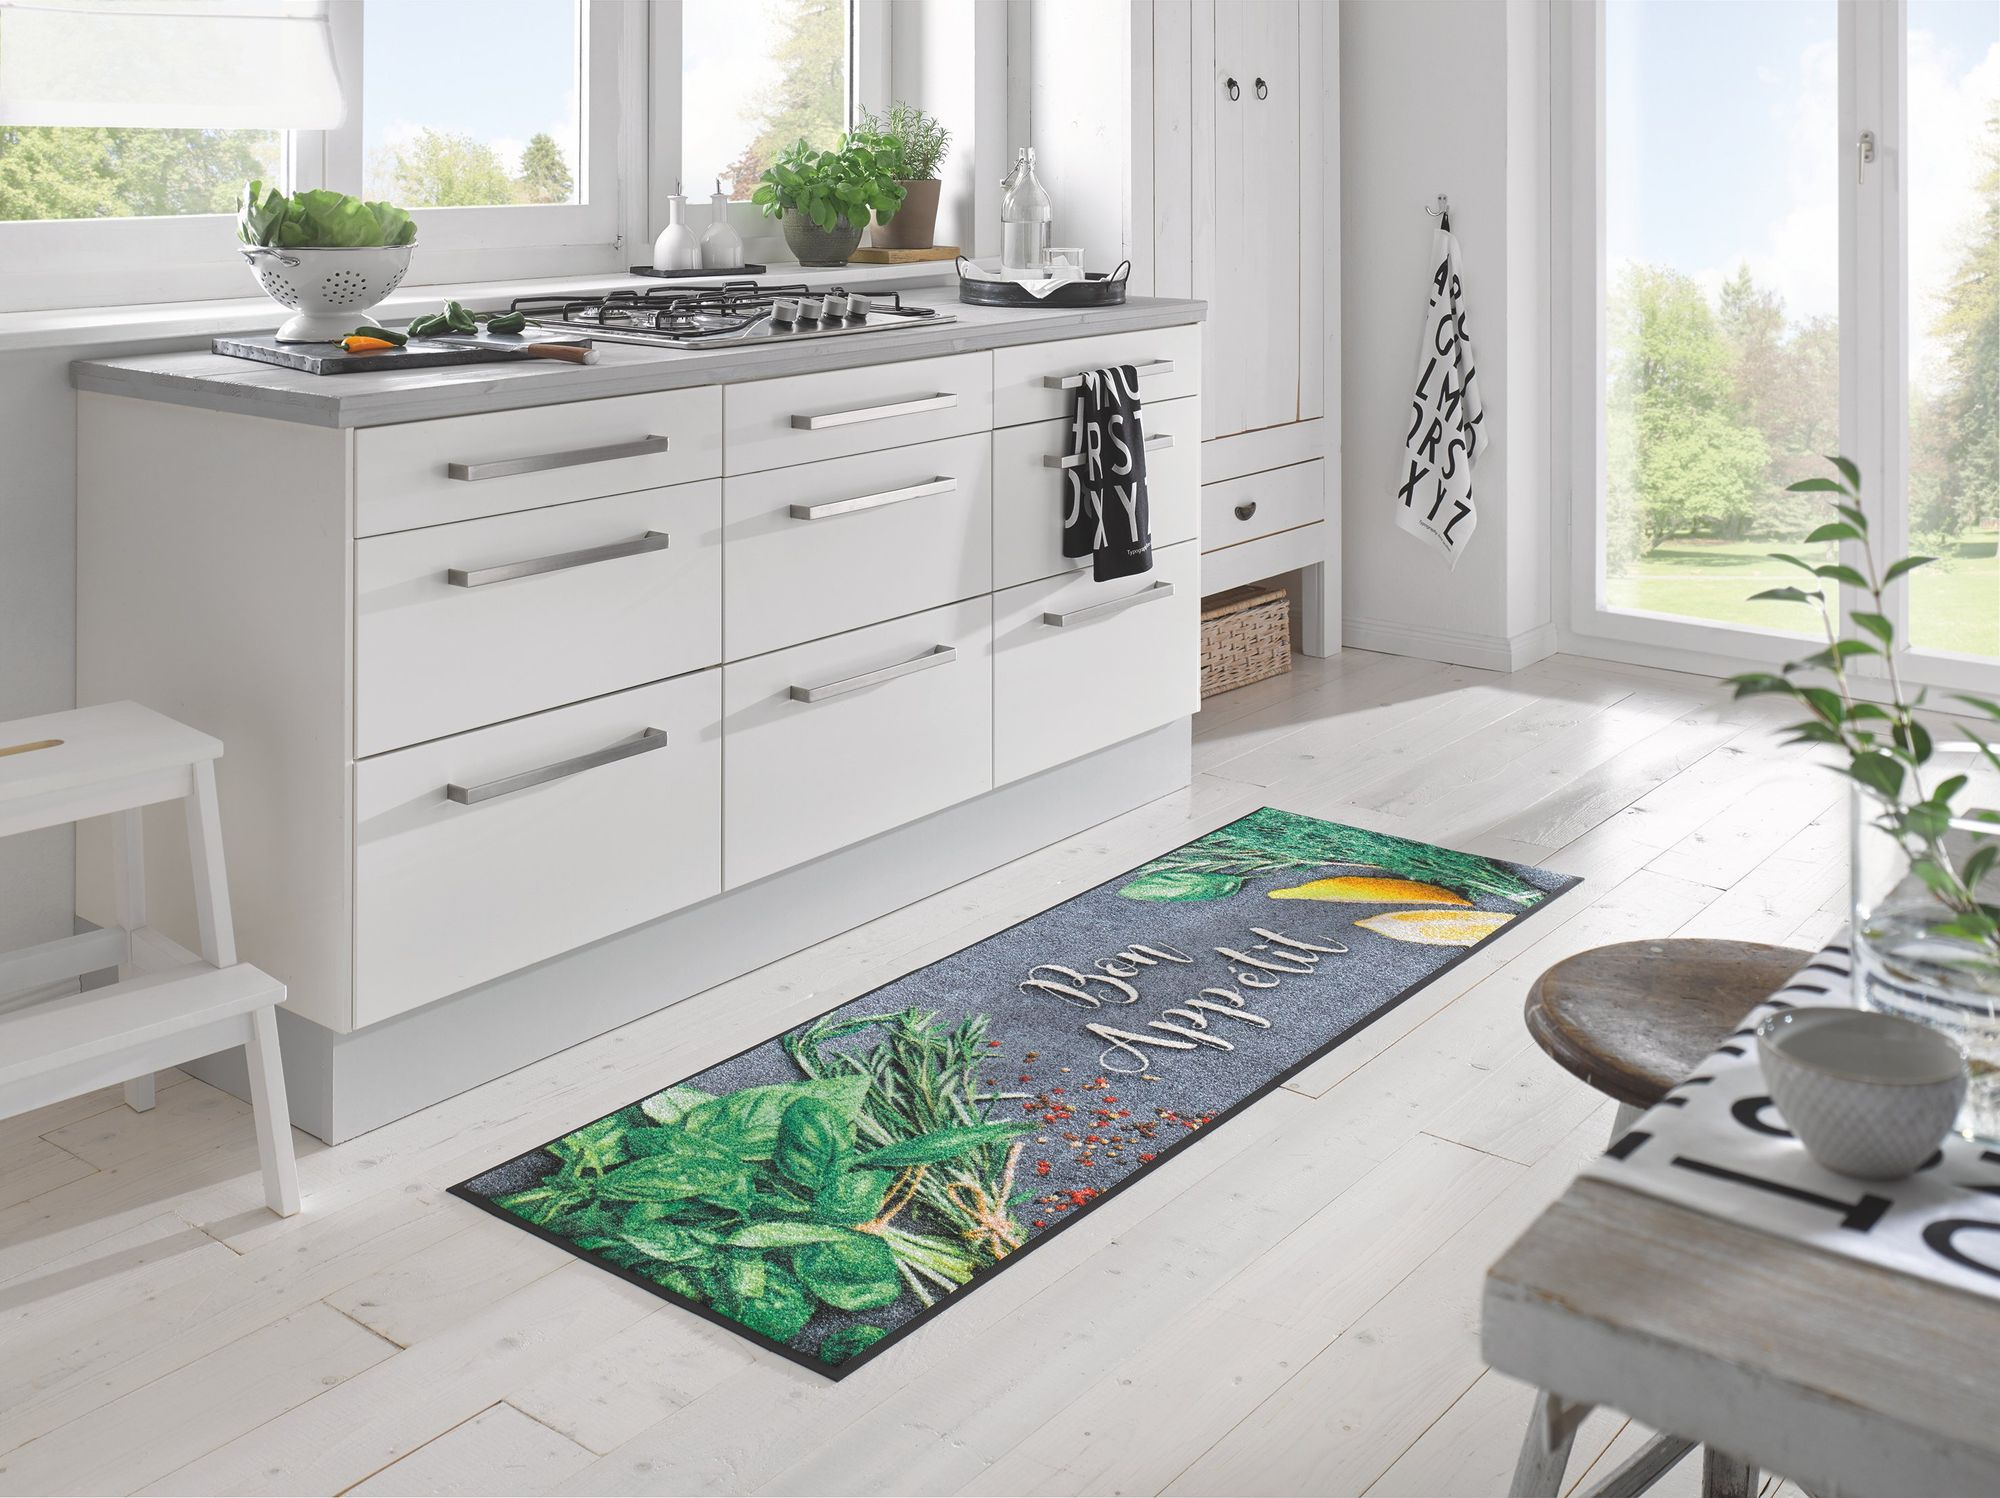 wash dry fu matte bon app tit k chenteppich waschbare fu matte. Black Bedroom Furniture Sets. Home Design Ideas